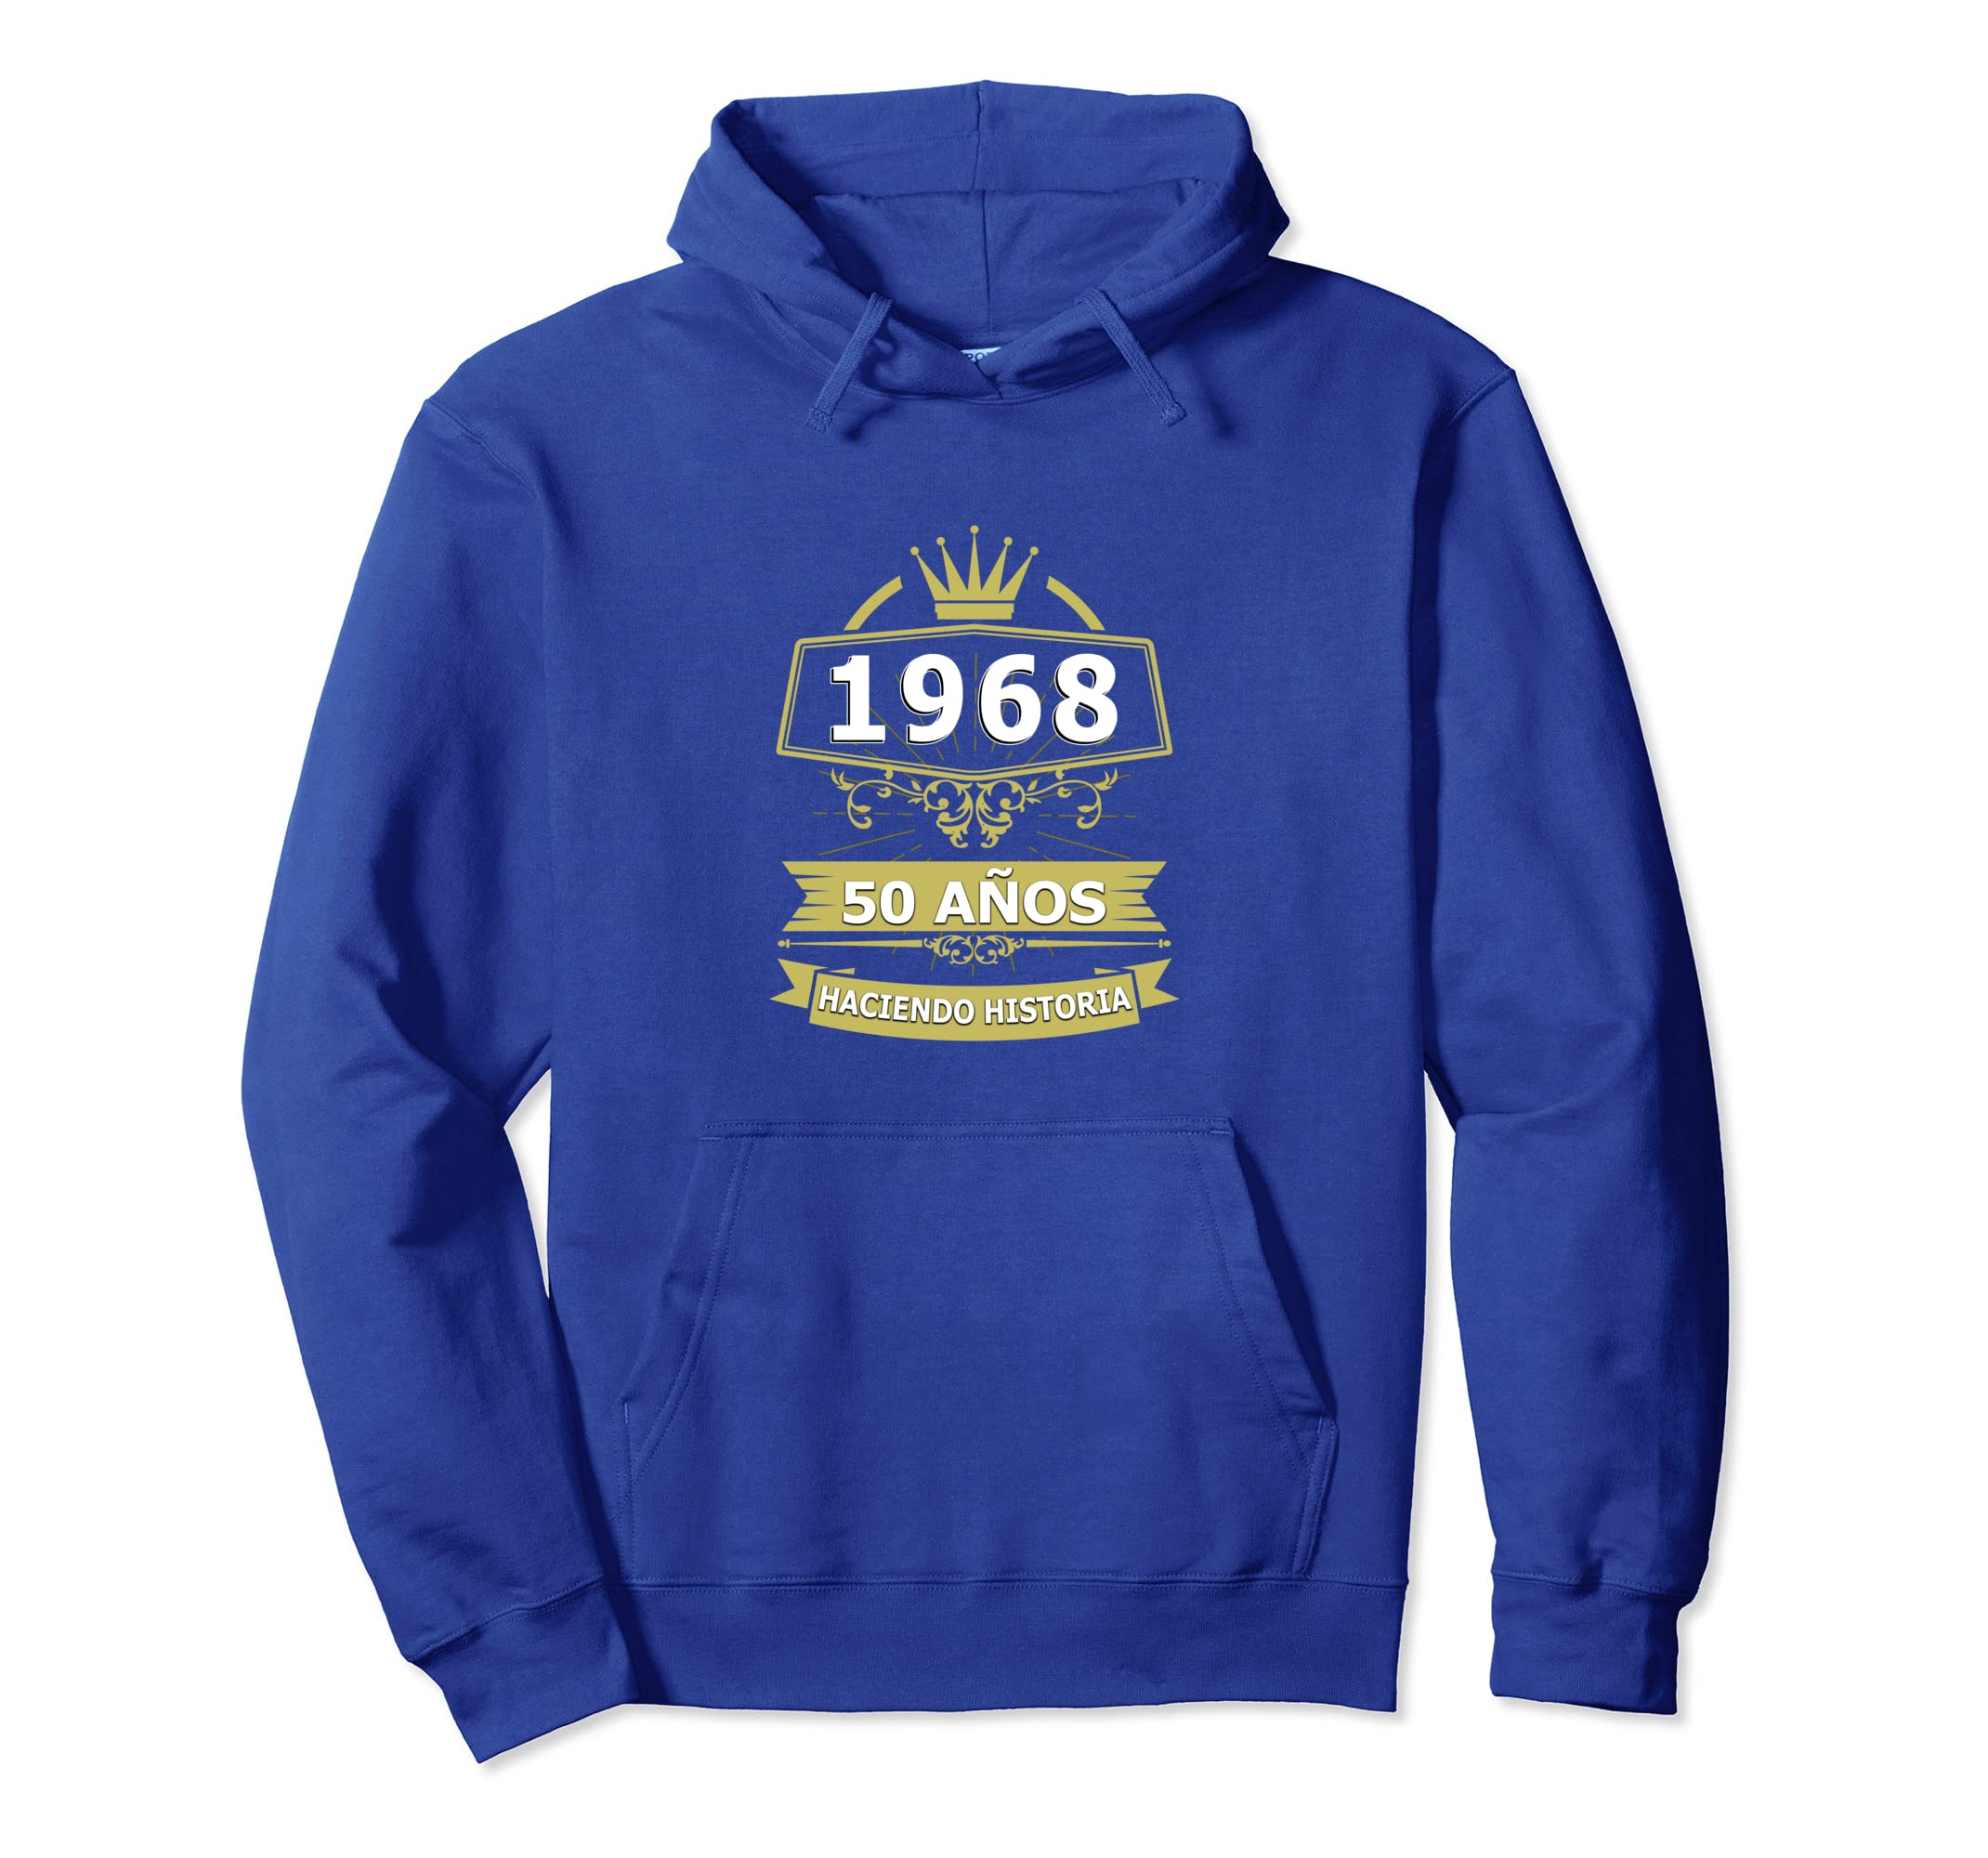 Amazon.com: Sudadera Cumpleanos 50 1968 50 Anos Haciendo Historia Hoodie: Clothing